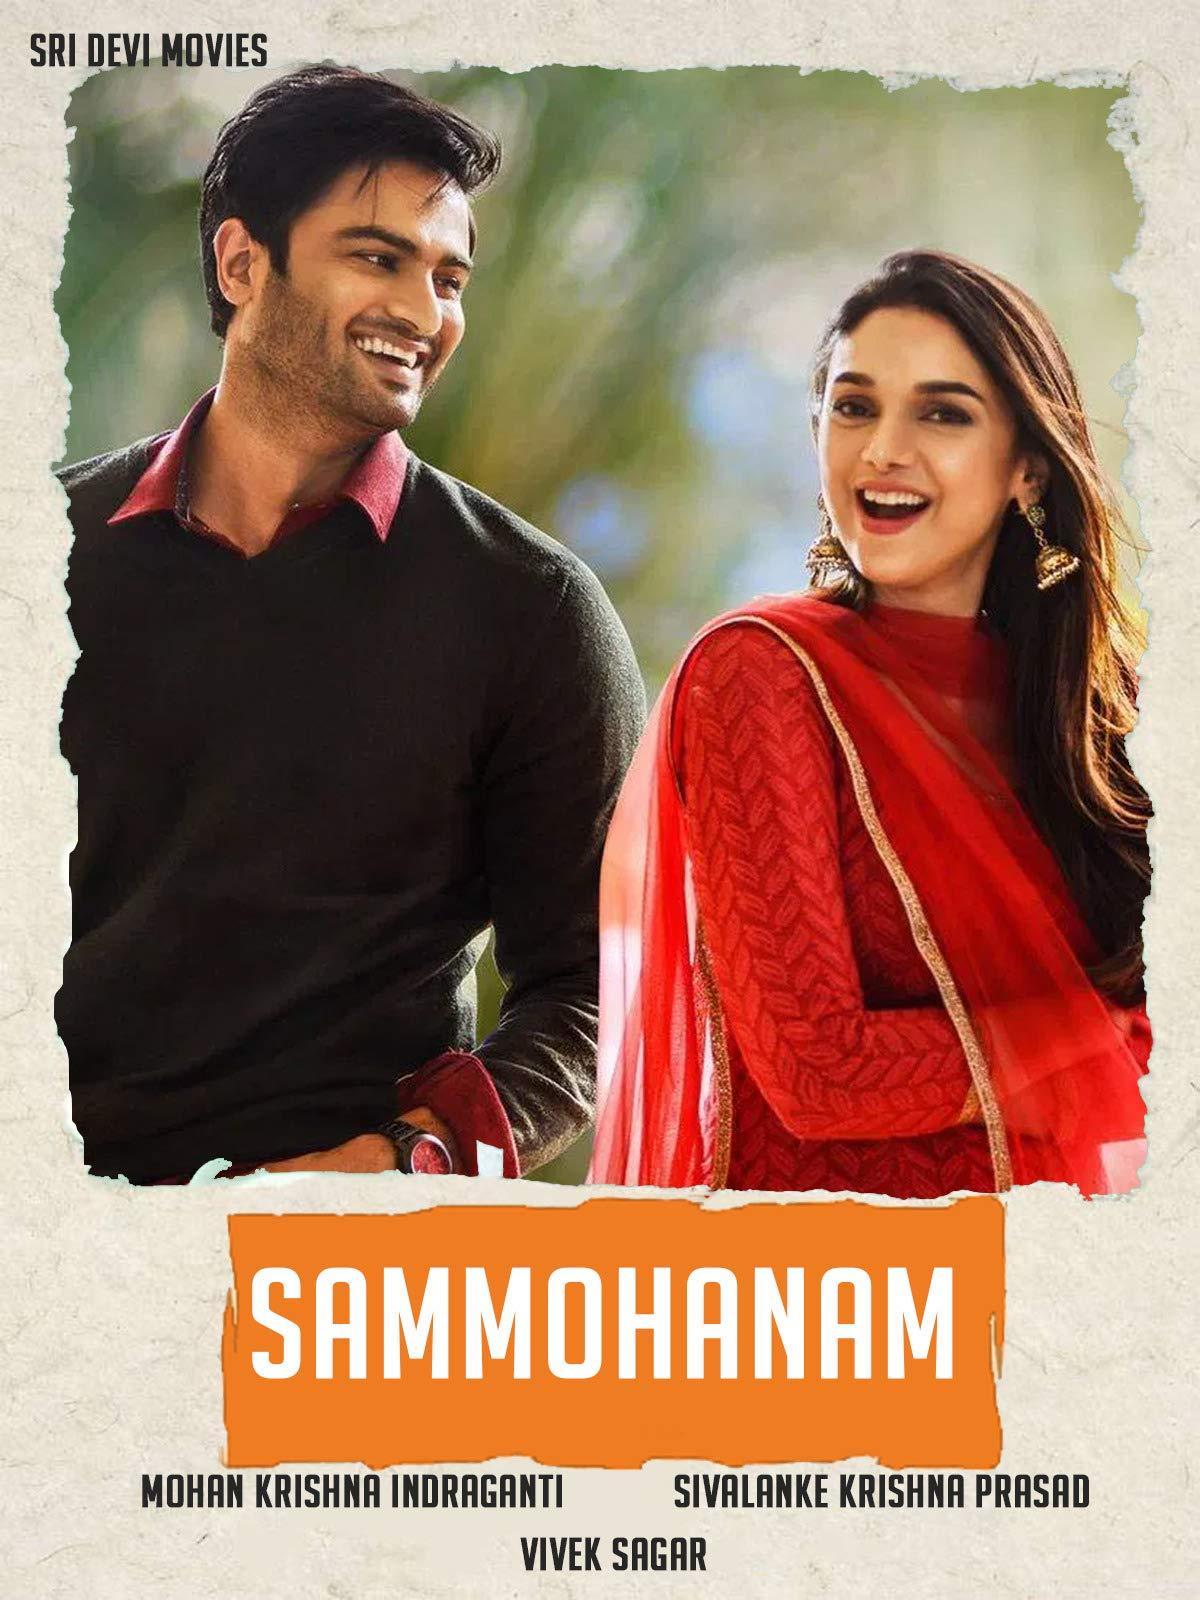 Sammohanam